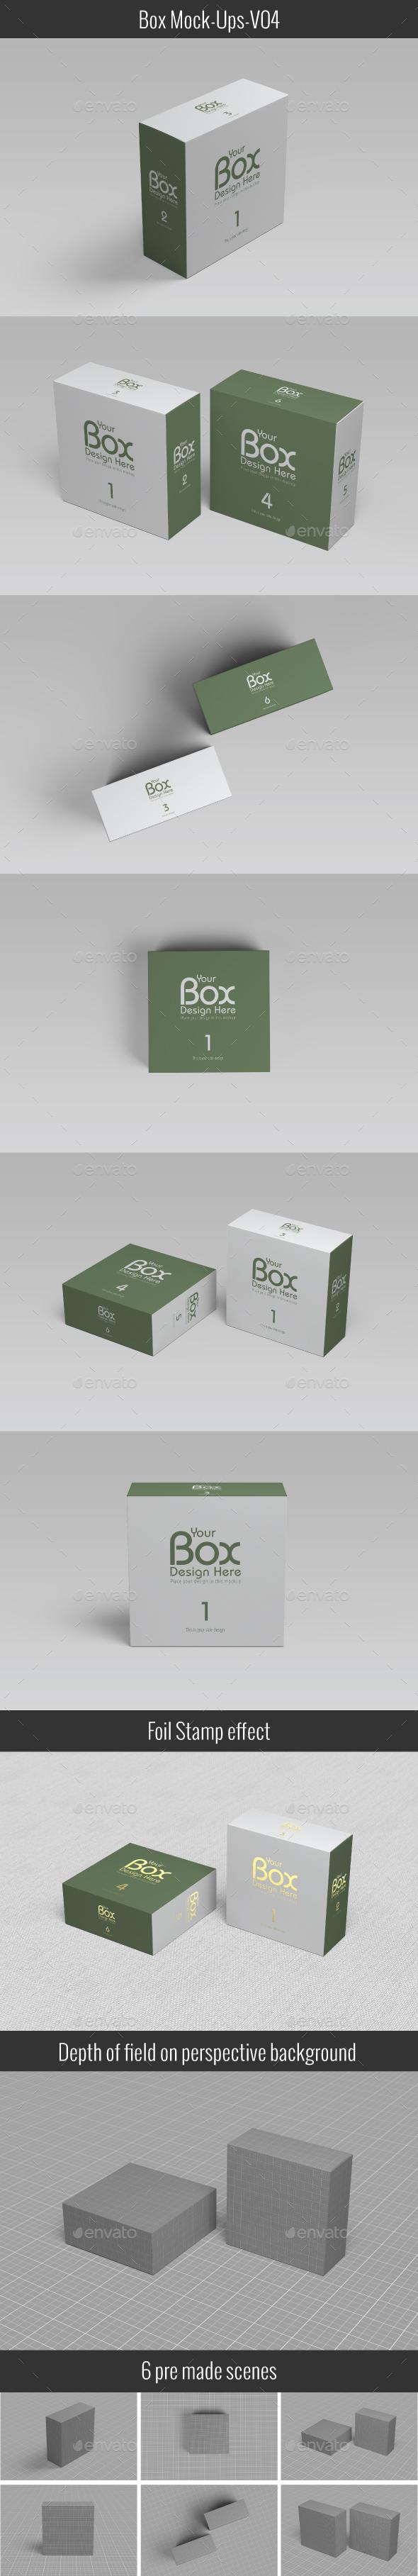 Package Box Mockups V-04 - Packaging Product Mock-Ups